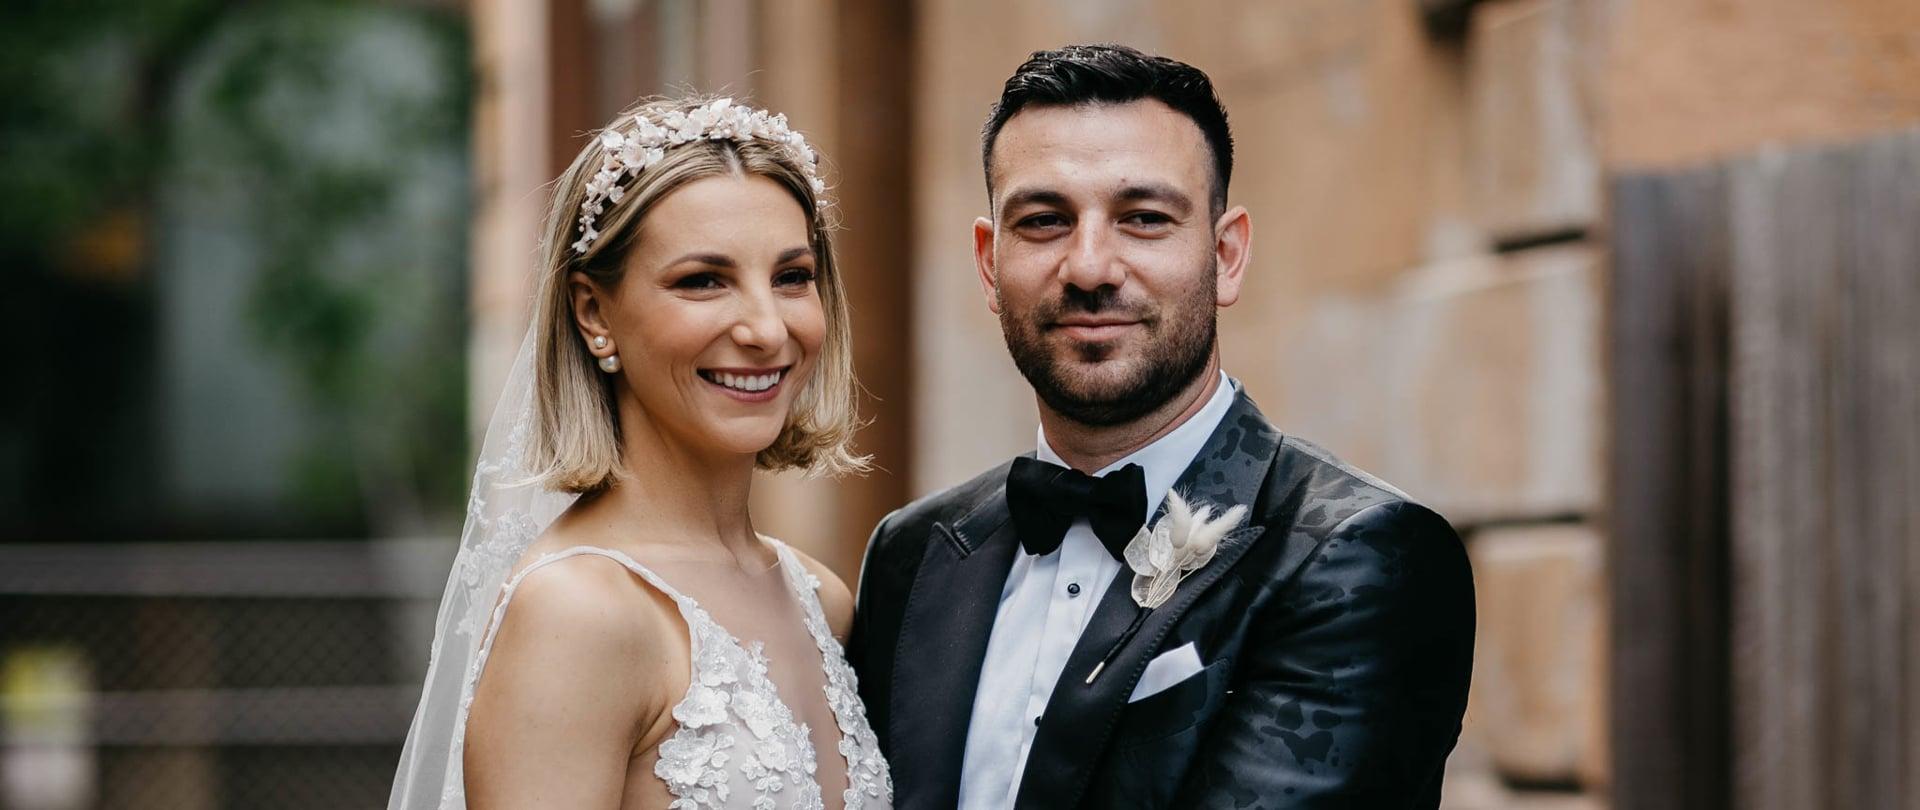 Jamie & Erin Wedding Video Filmed at Sydney, New South Wales